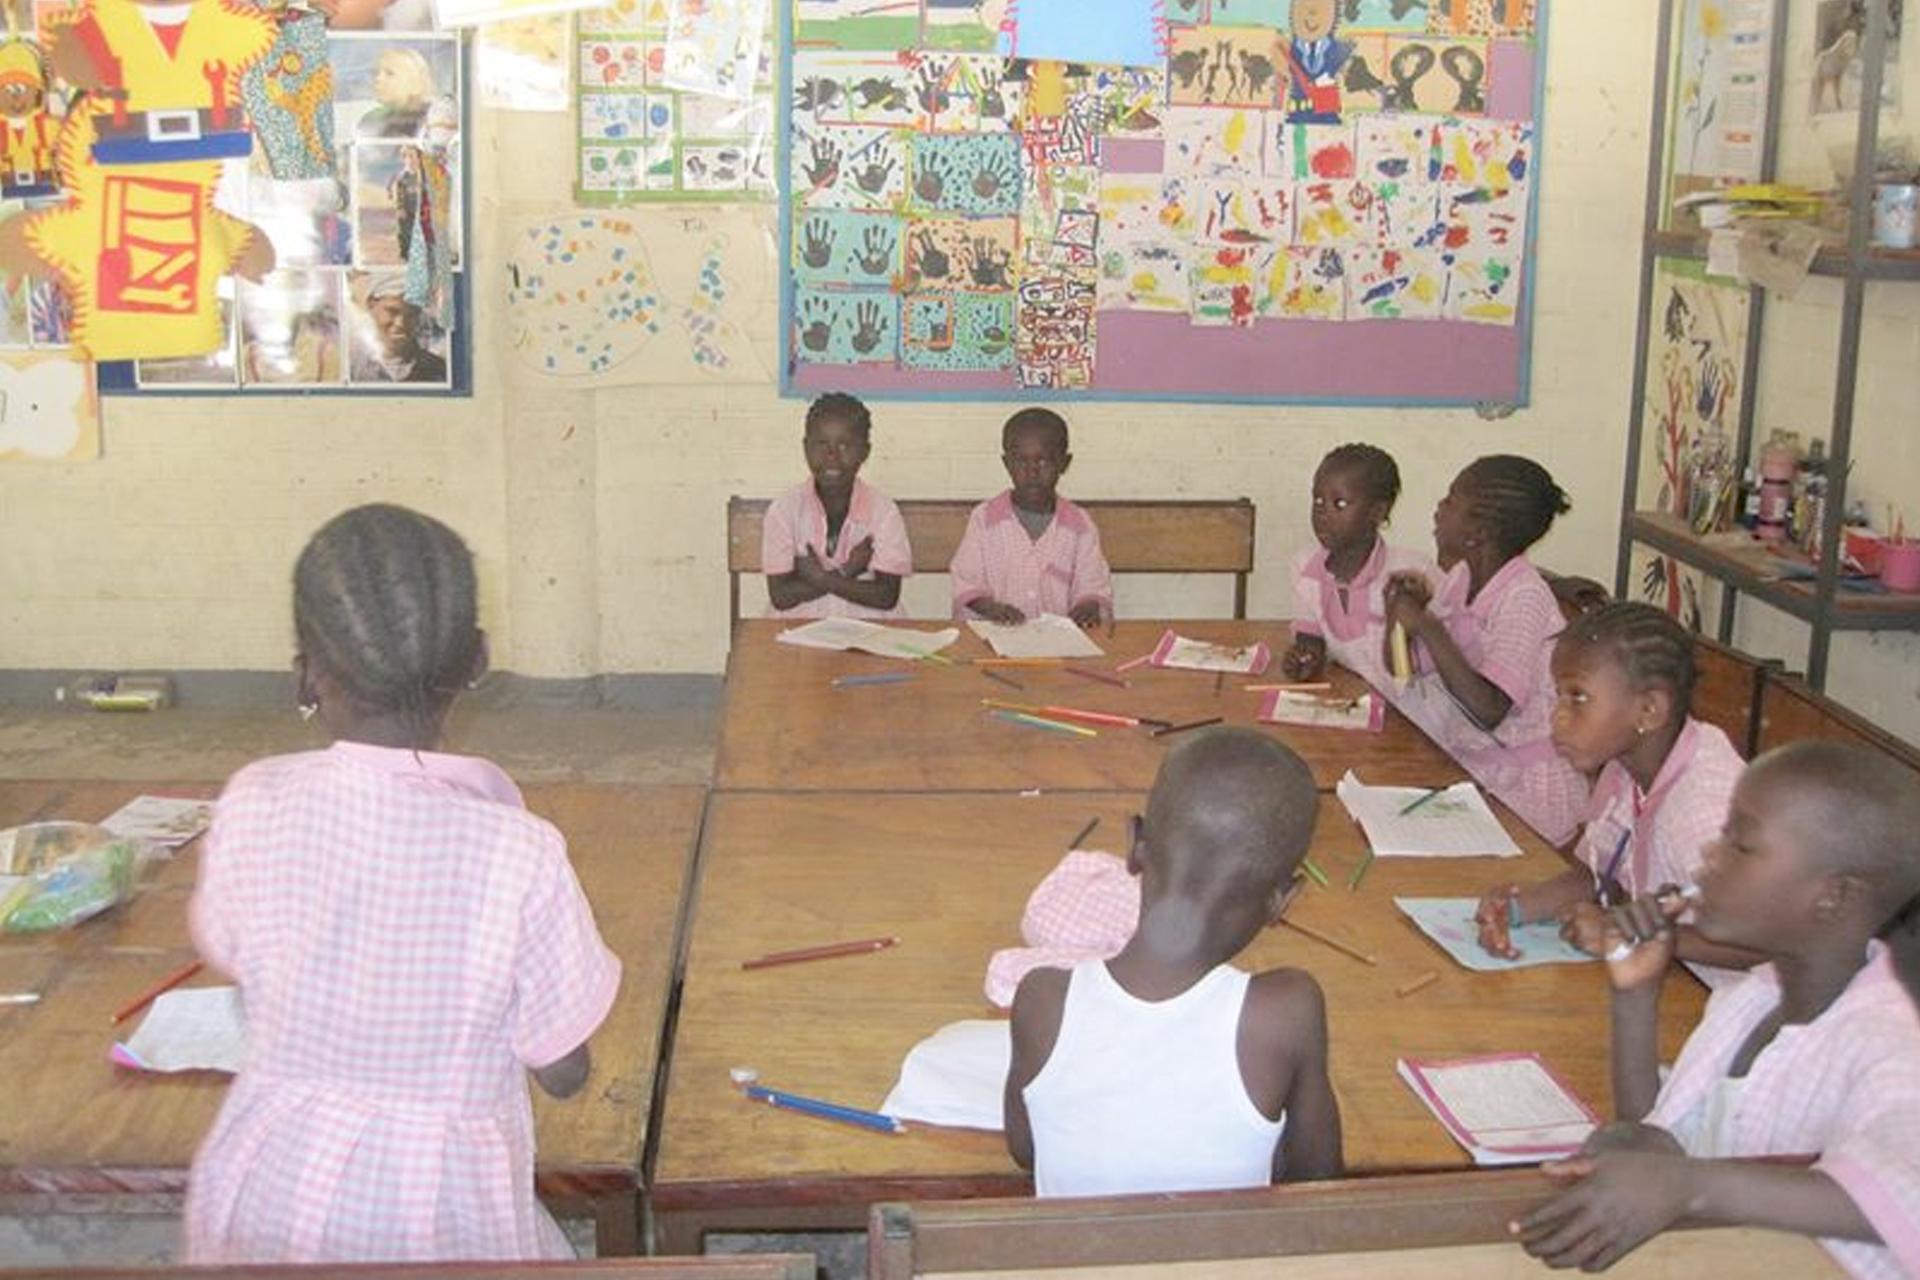 gunjur community pré-school